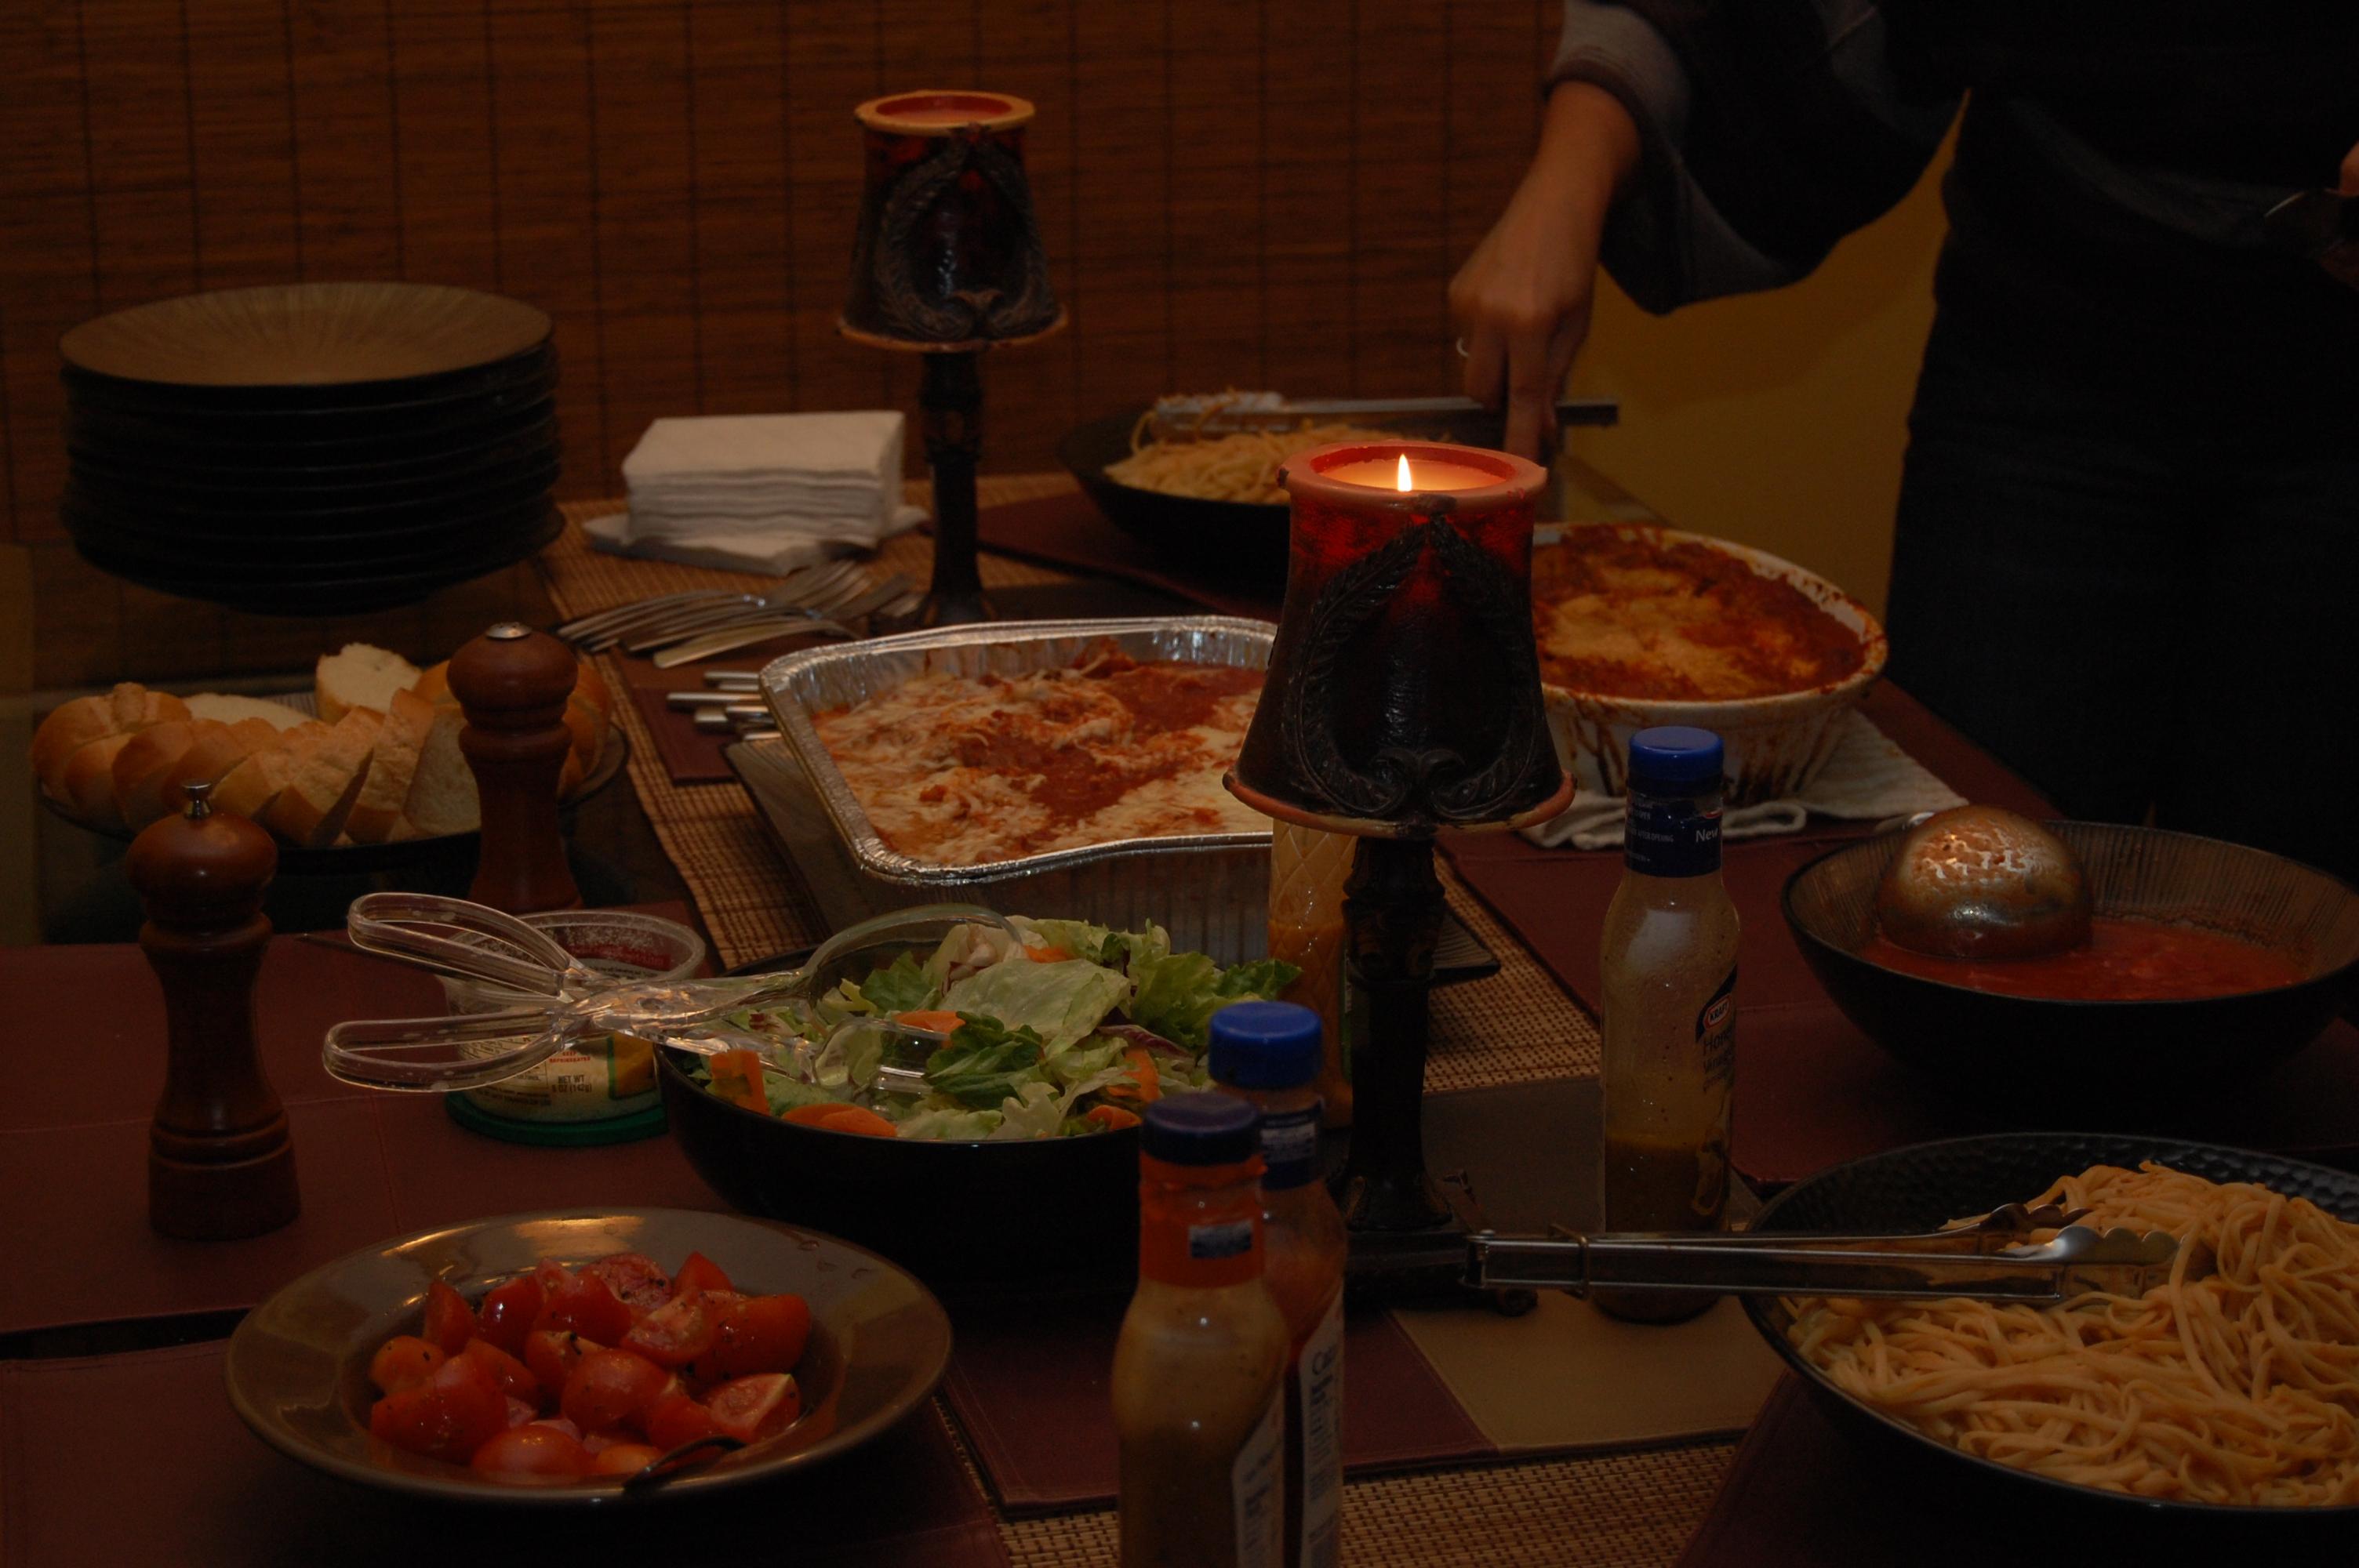 We had a LOT of food!